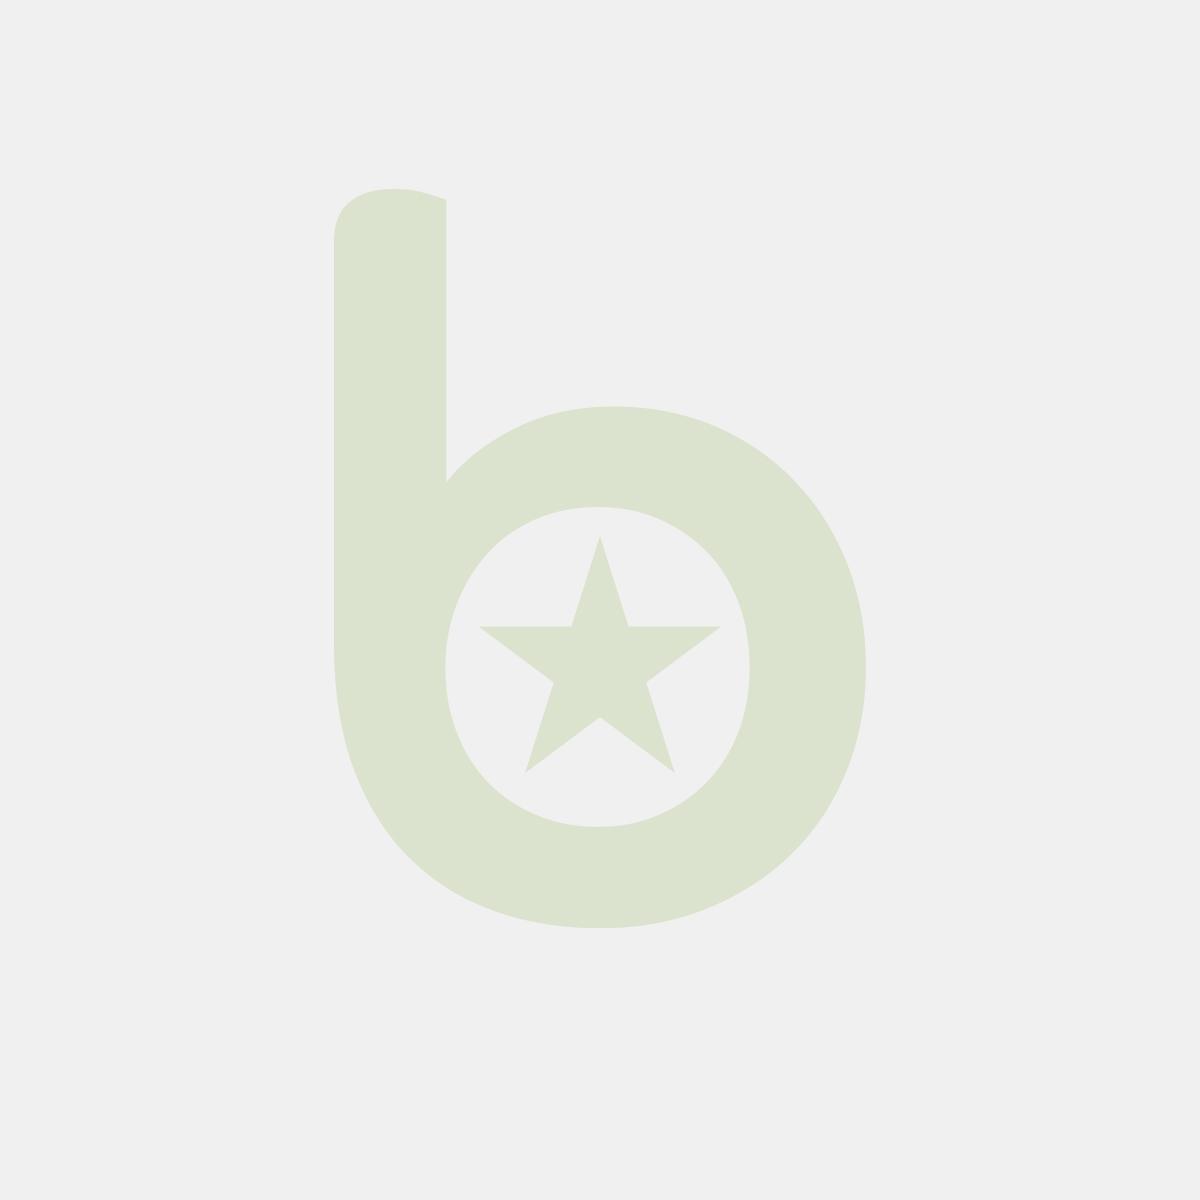 Migdały prażone solone BAKAL Vintage, 100g